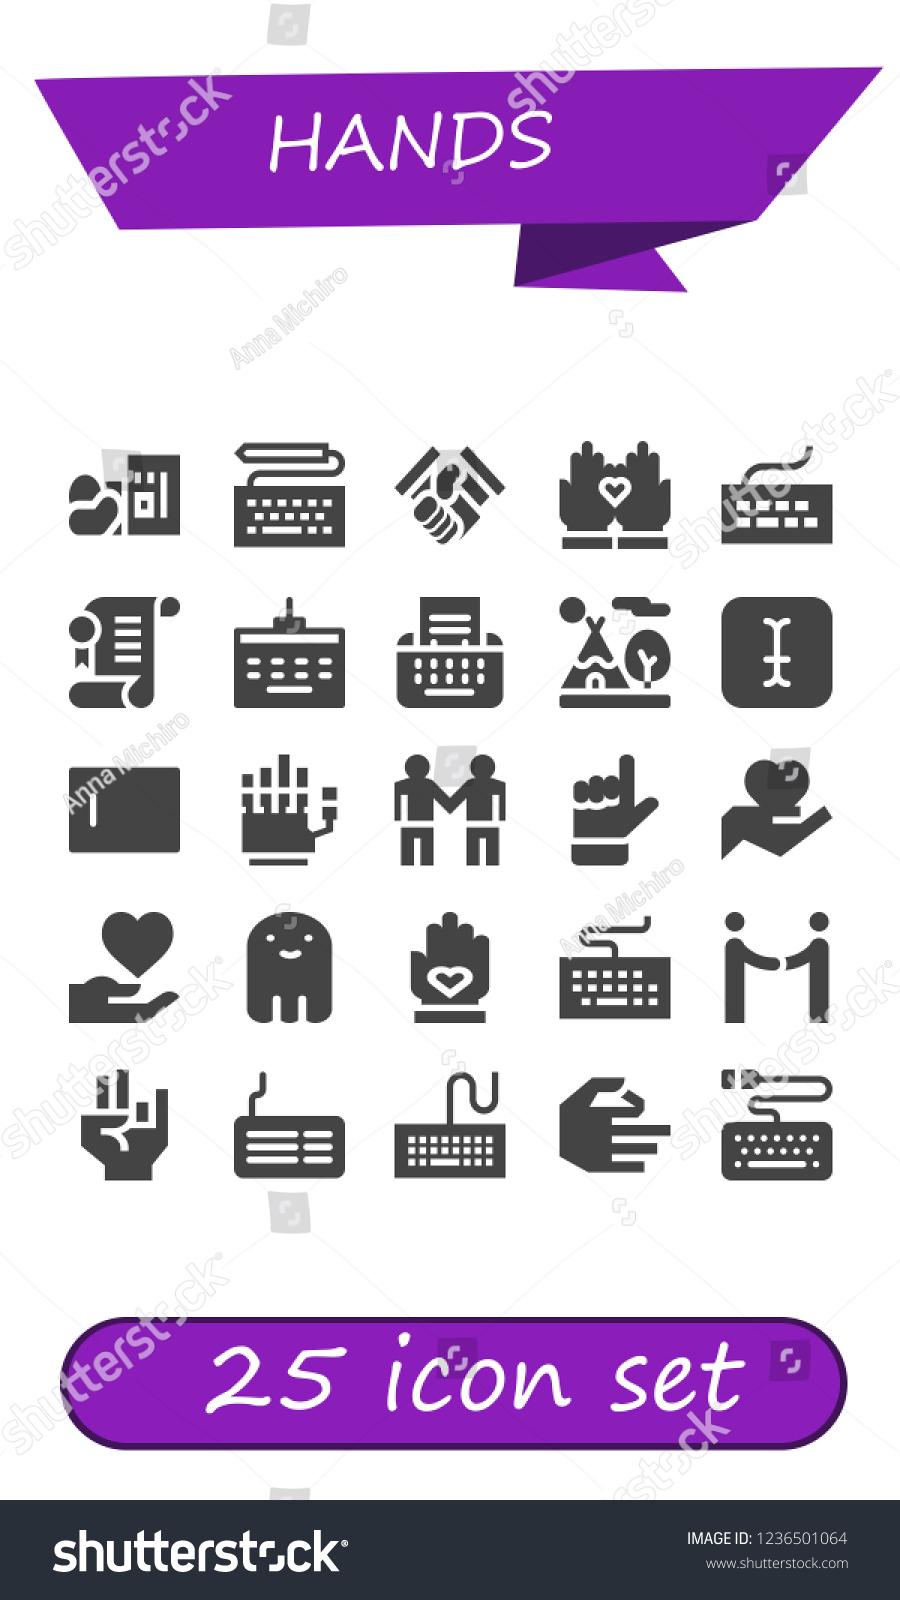 Vector Icons Pack 25 Filled Hands เวกเตอร์สต็อก (ปลอดค่า